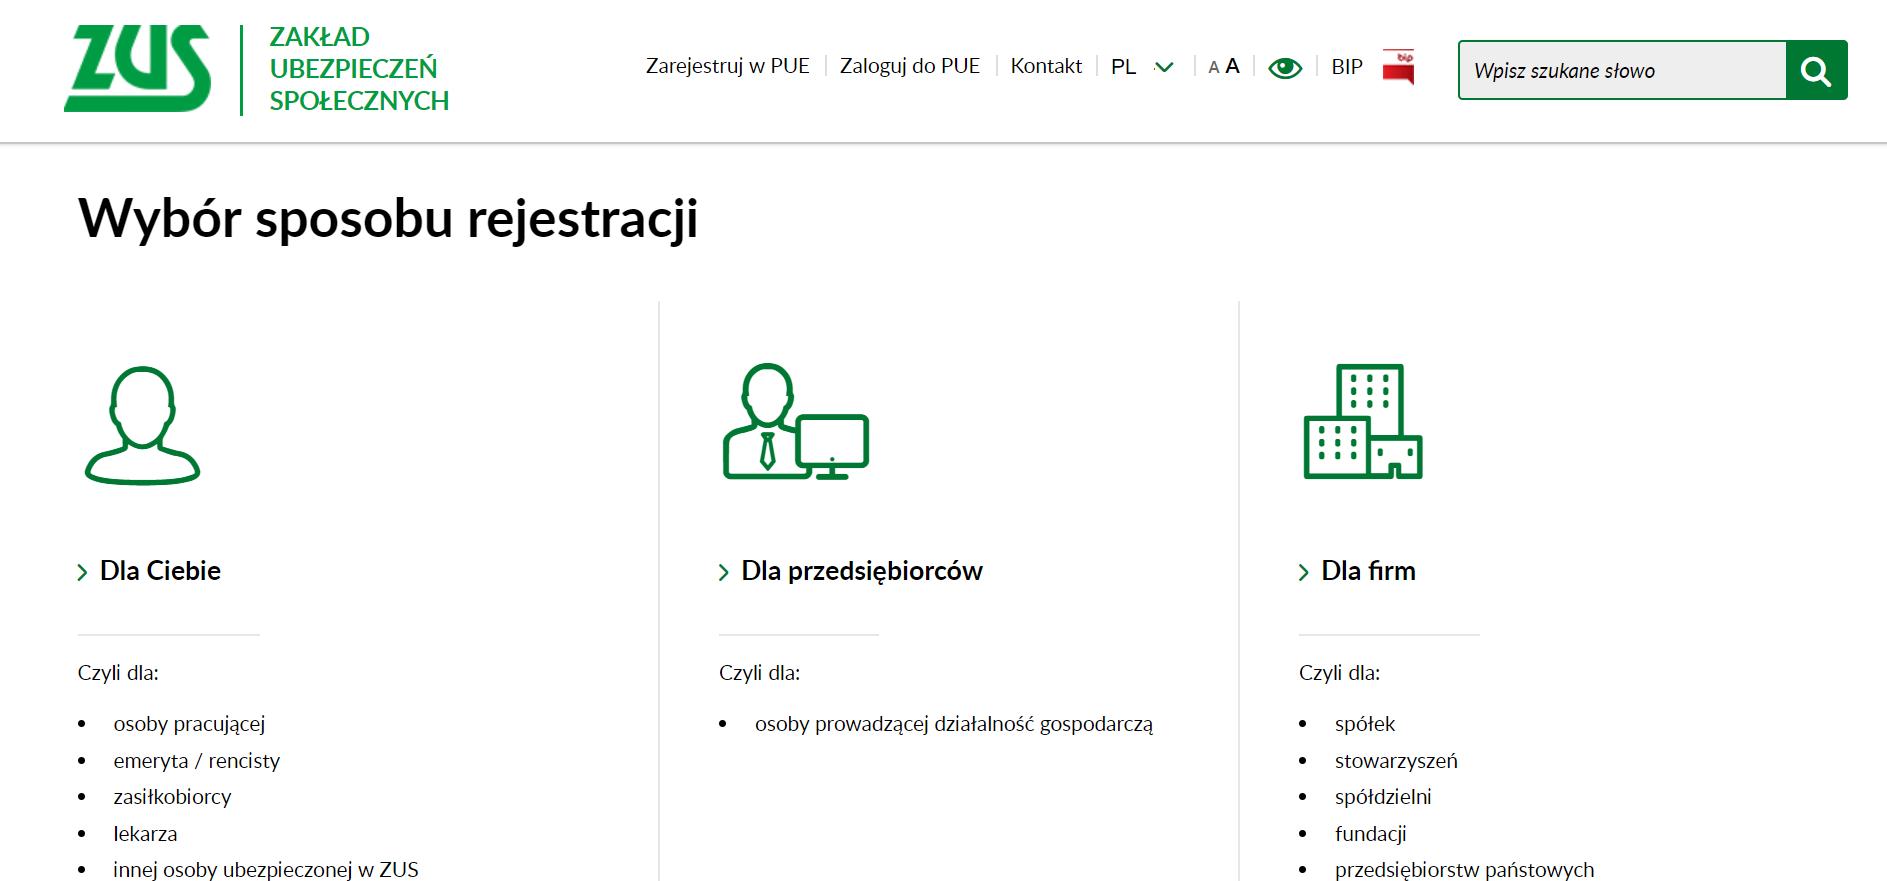 ifirma.pl program do księgowania - zus pue2